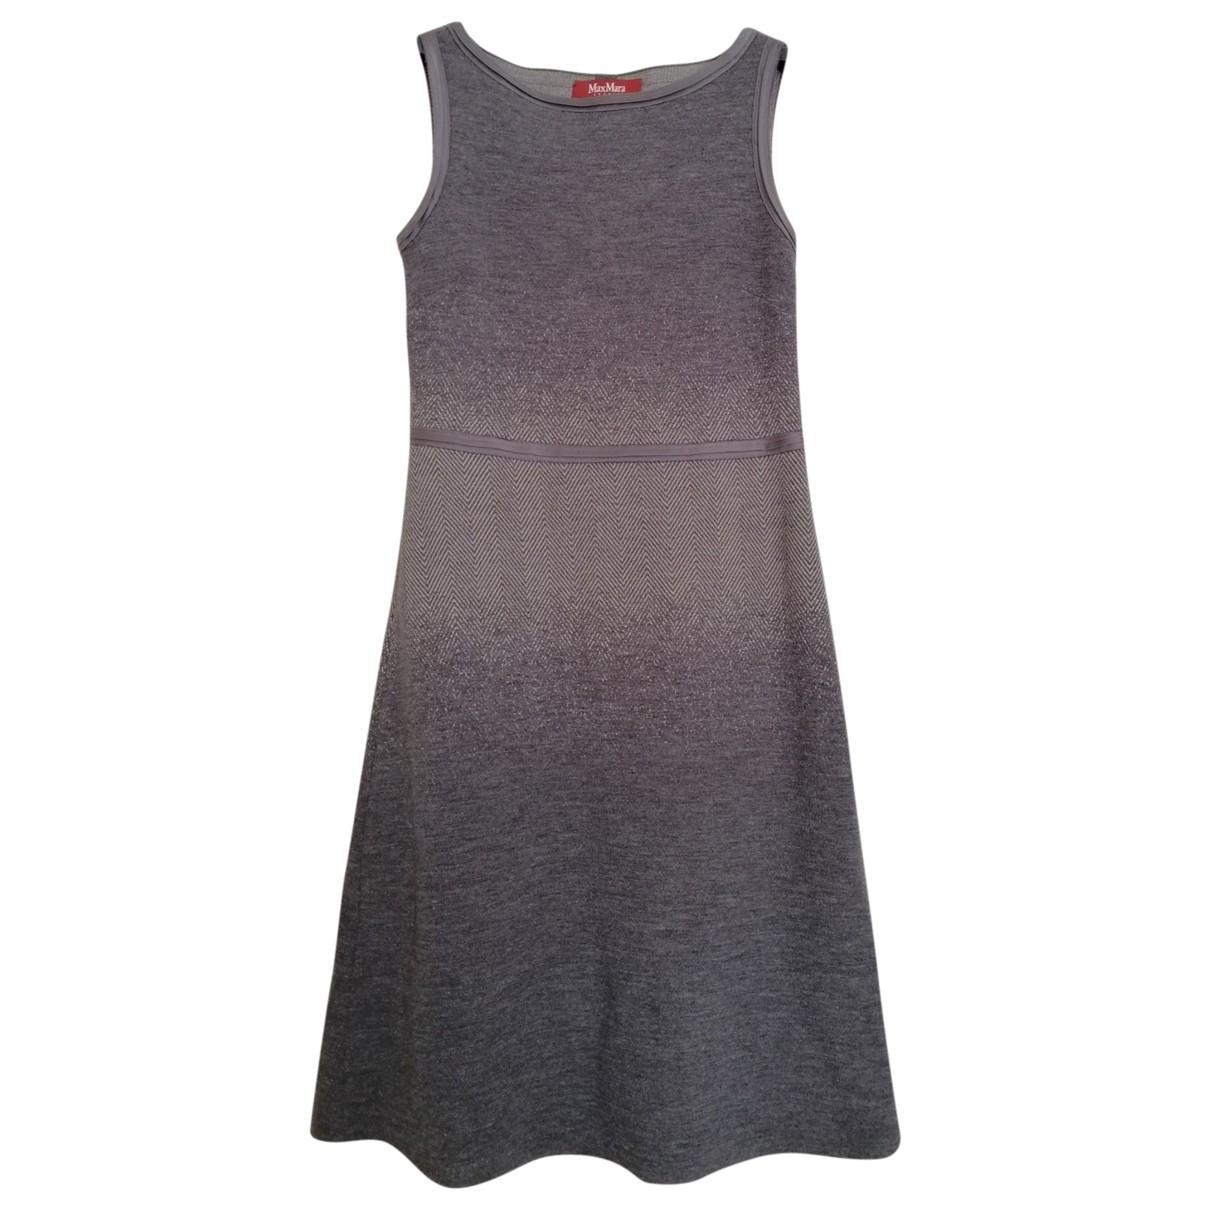 Max Mara Studio \N Grey dress for Women S International